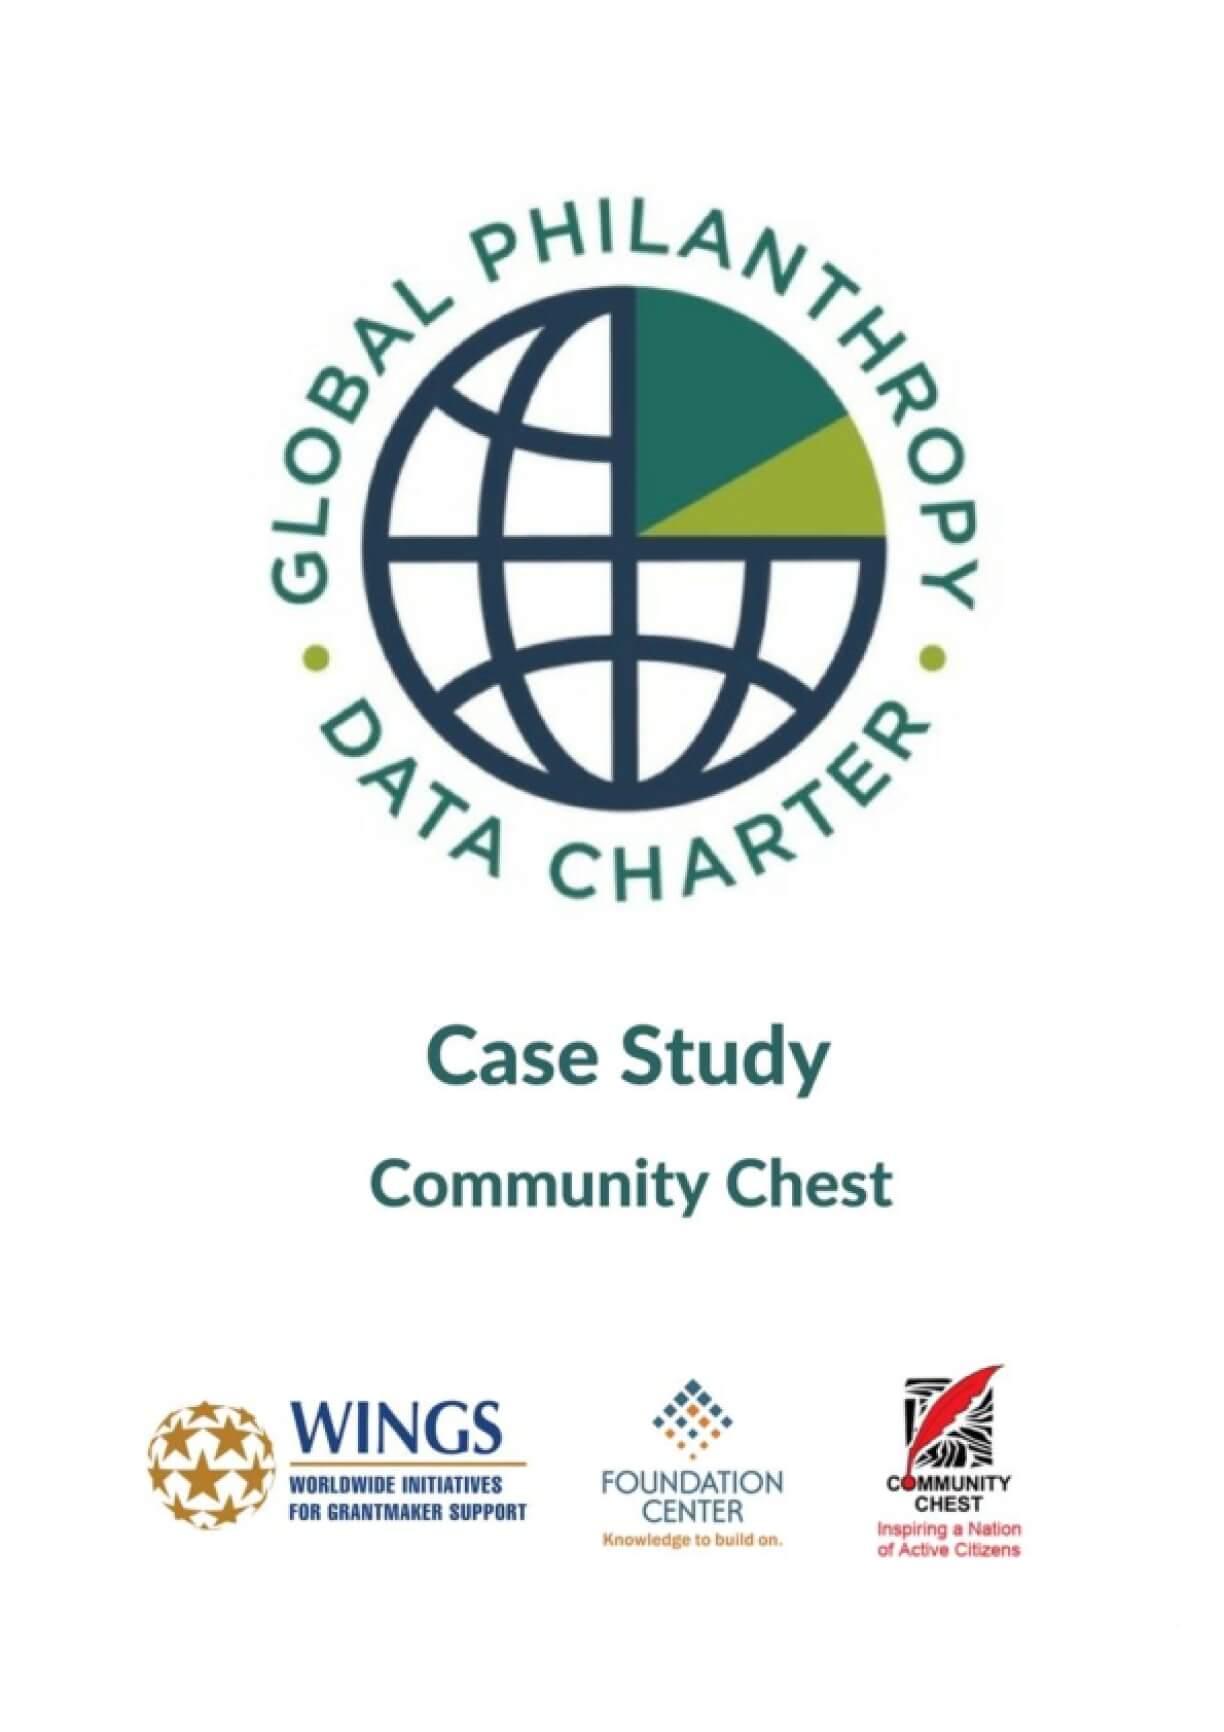 Global Philanthropy Data Charter - Community Chest Case Study